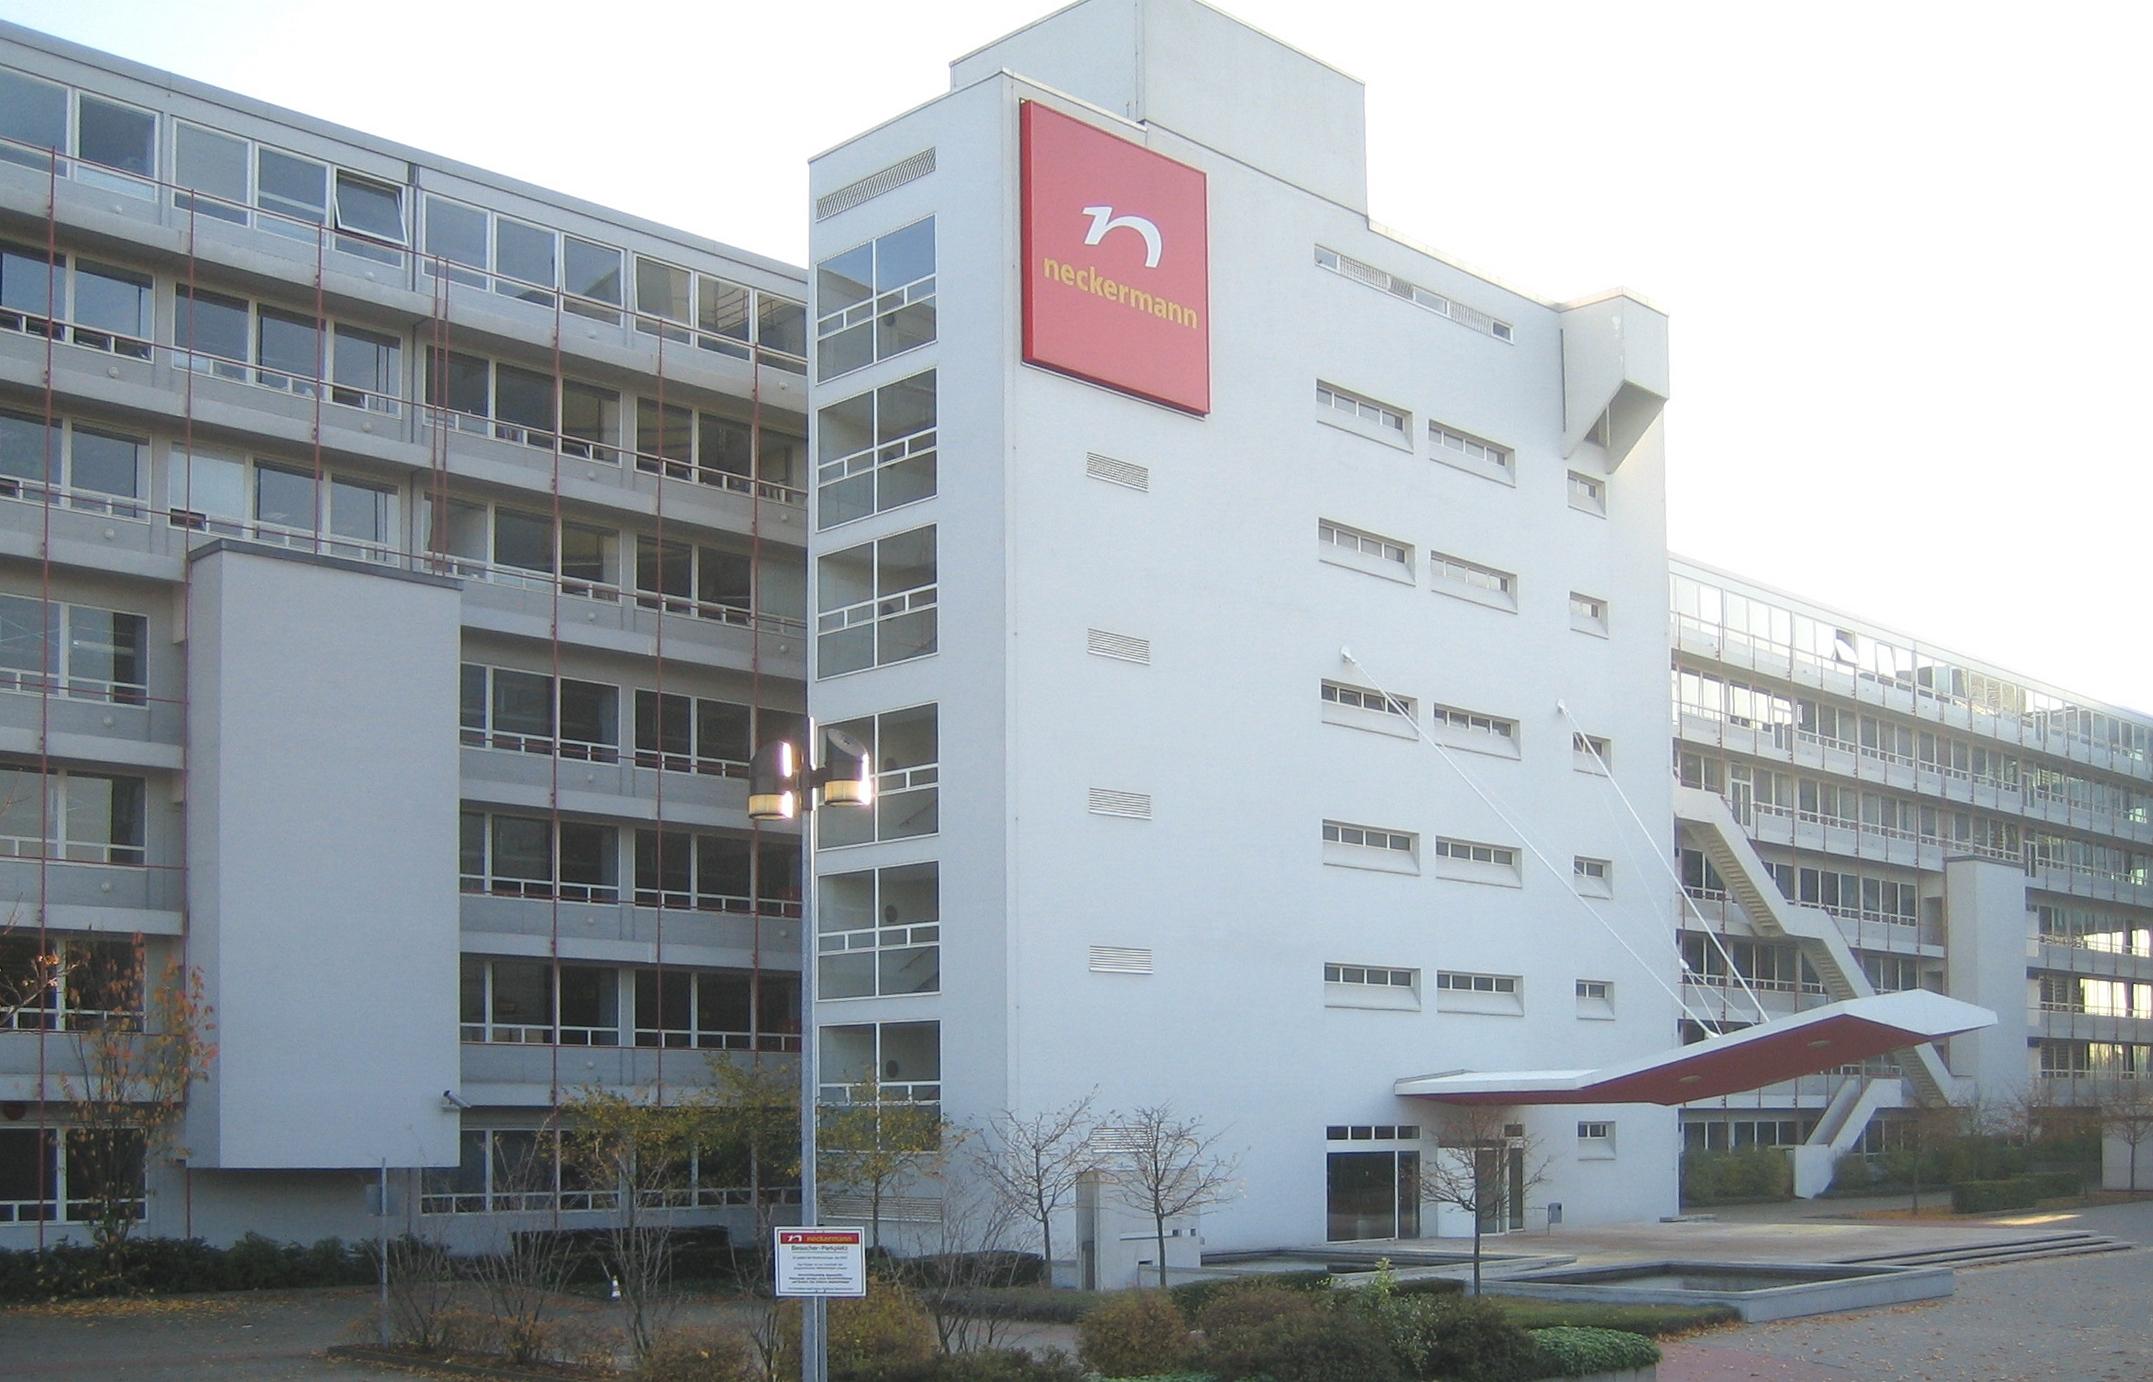 Frankfurt am Main, Neckermann-Gebäude (Egon Eiermann, 1958-61)